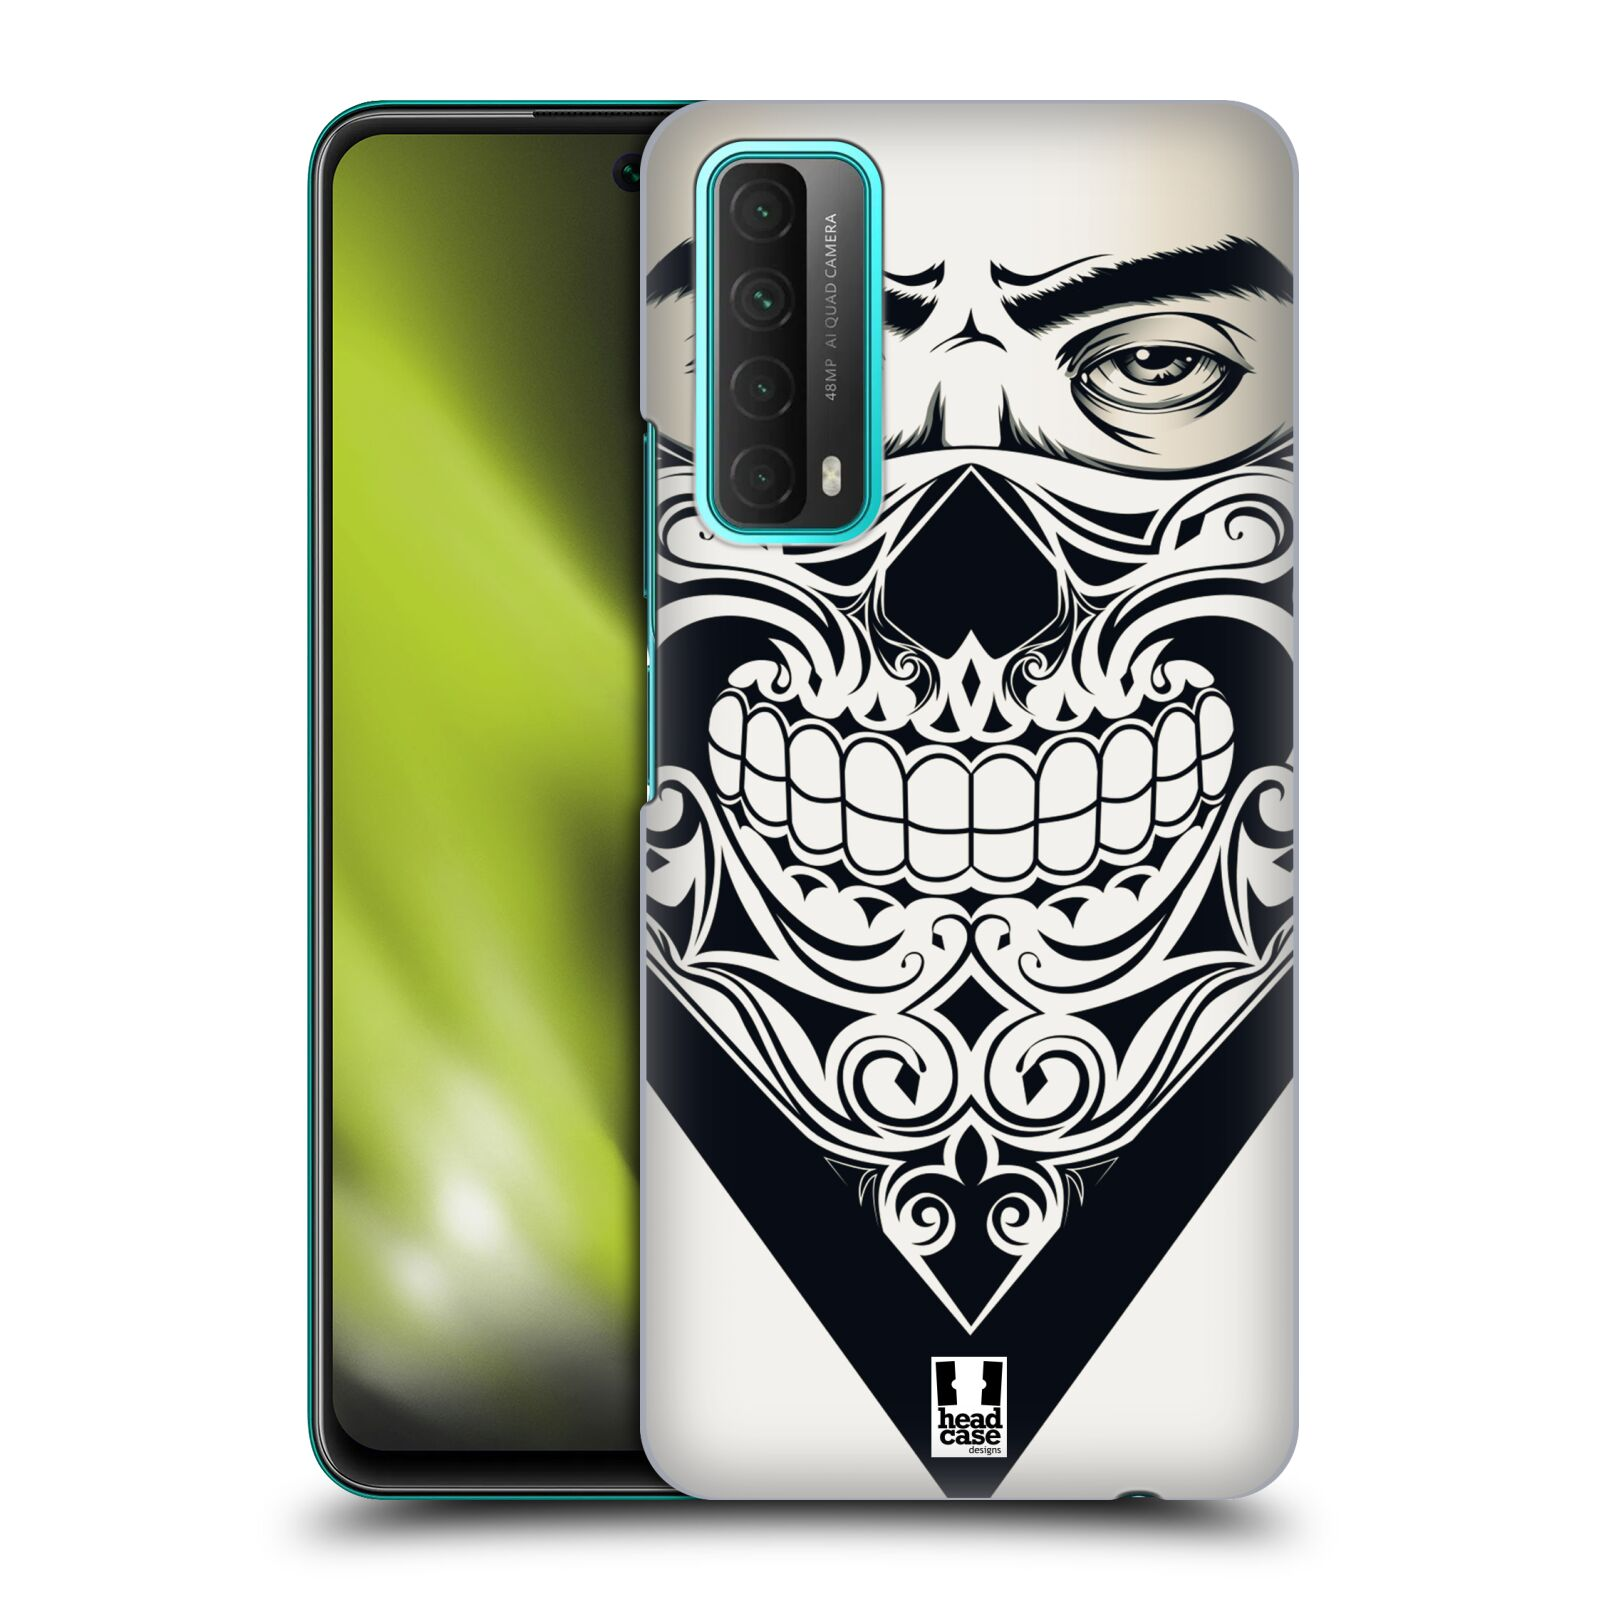 Plastové pouzdro na mobil Huawei P Smart (2021) - Head Case - LEBKA BANDANA